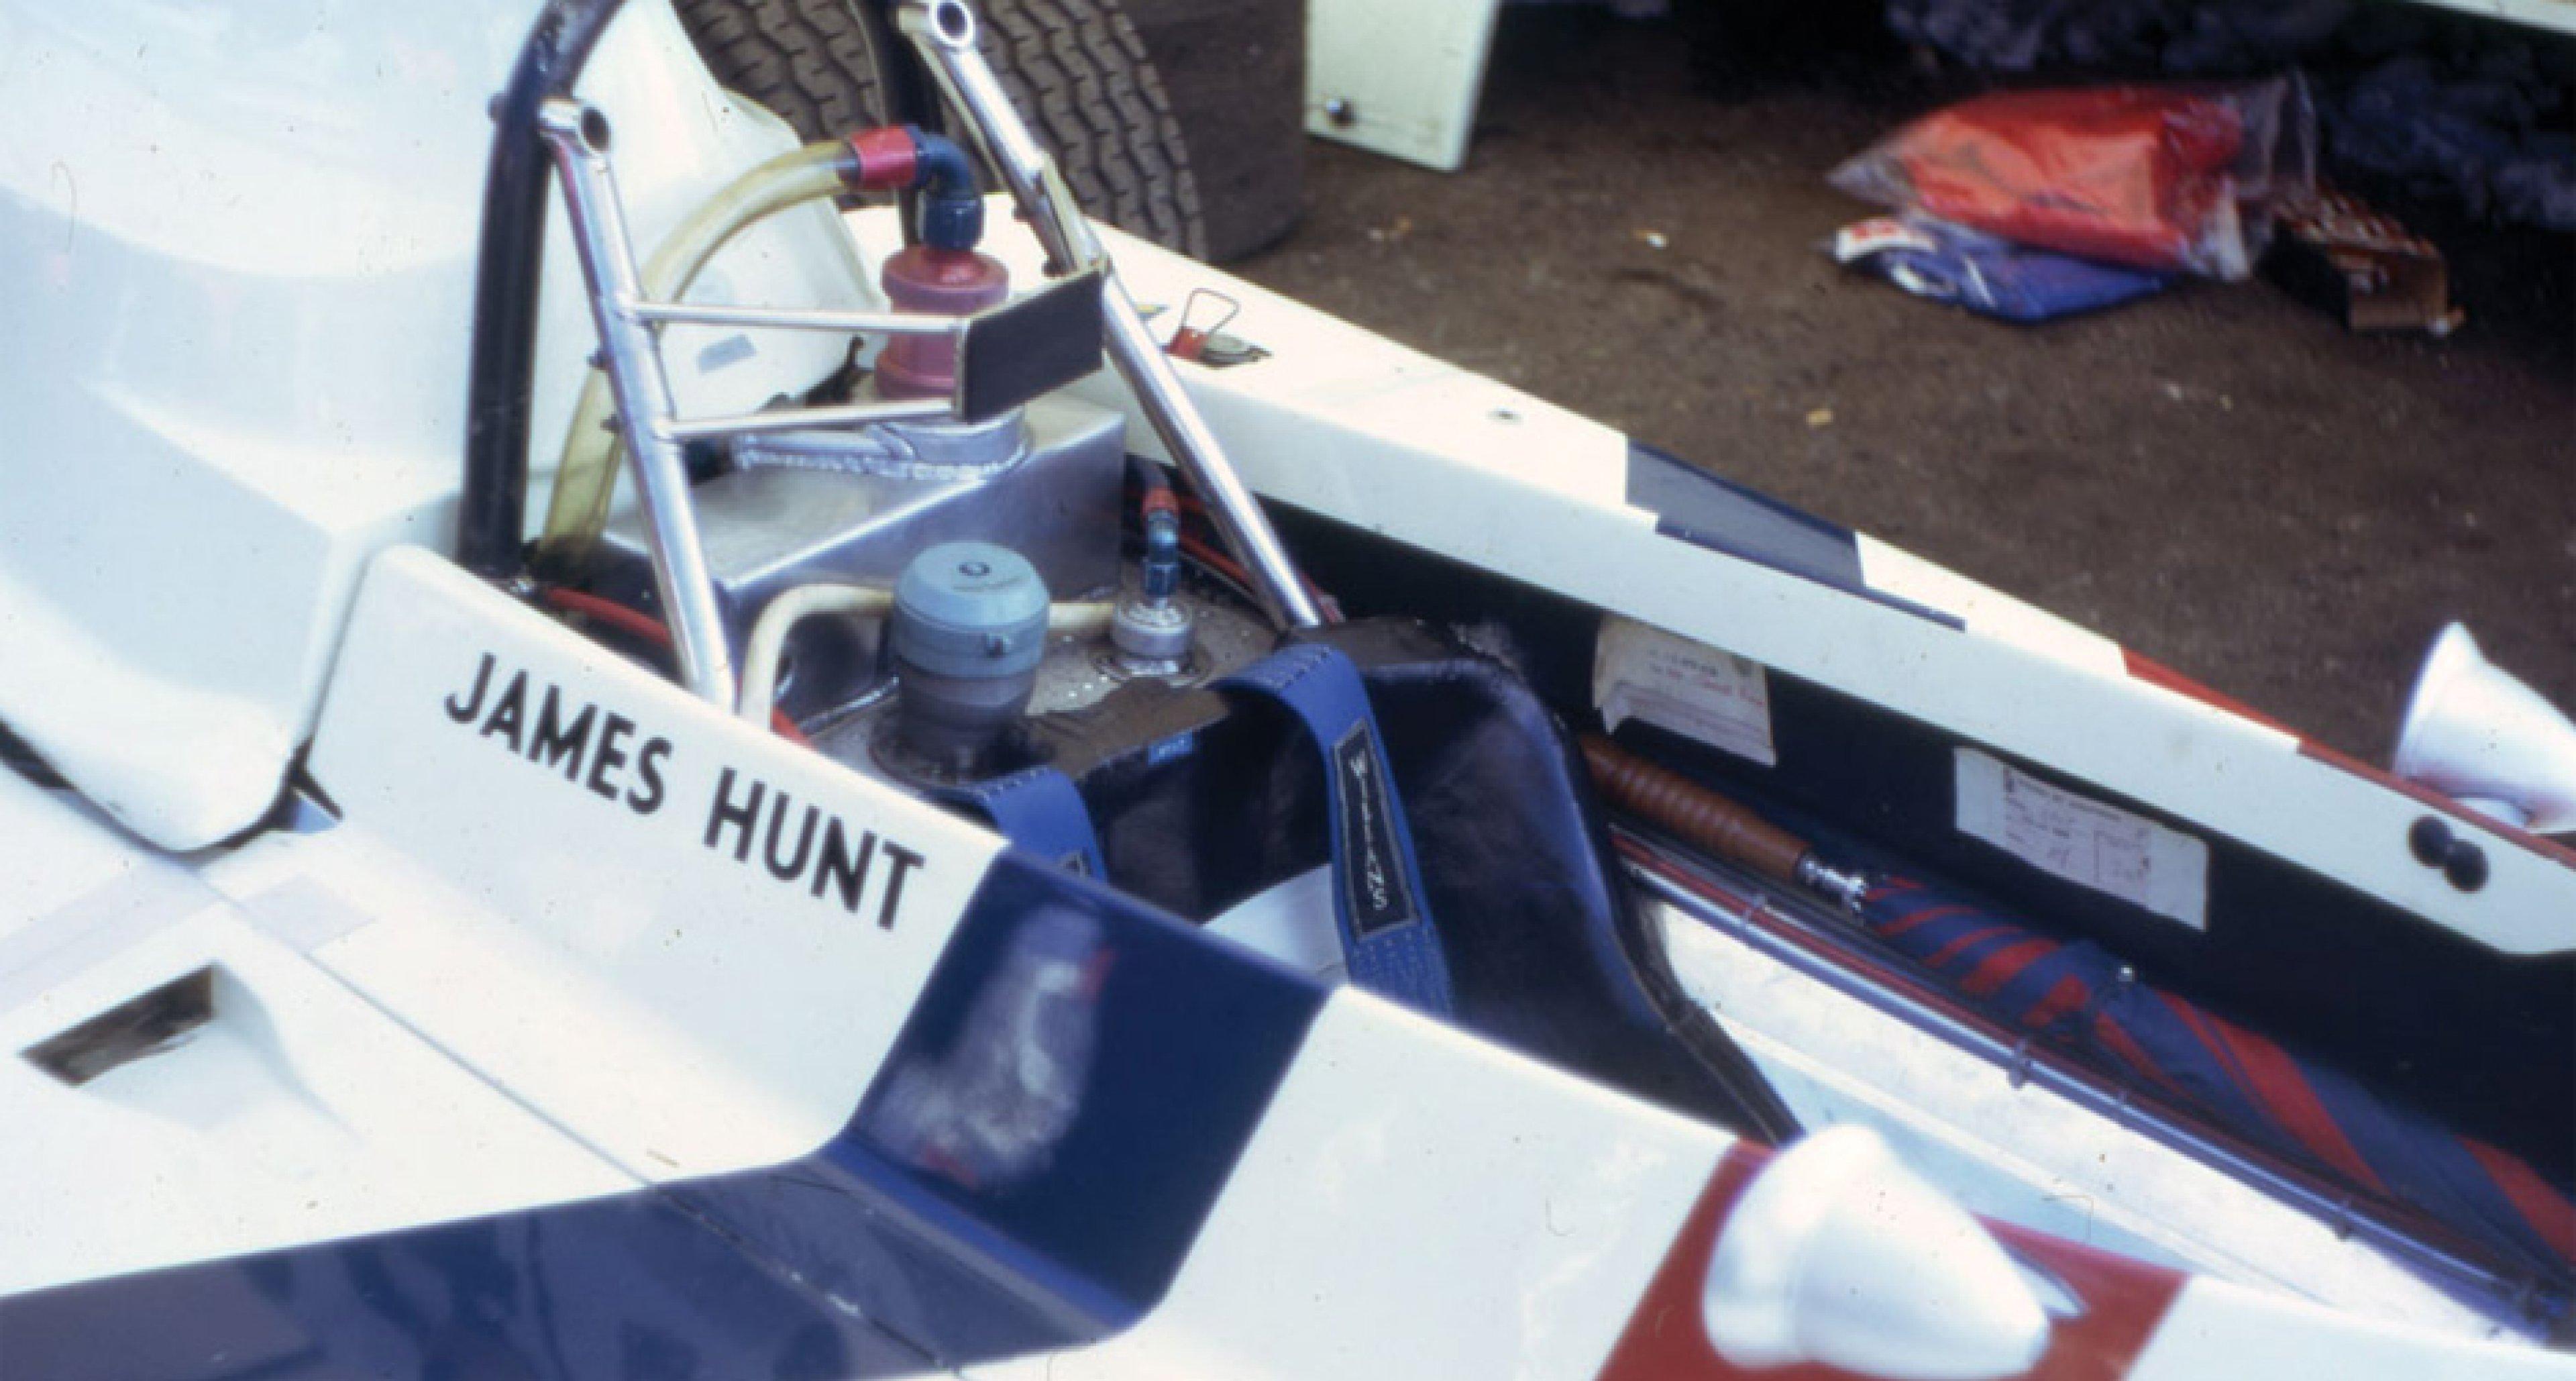 James Hunts Hesketh 308